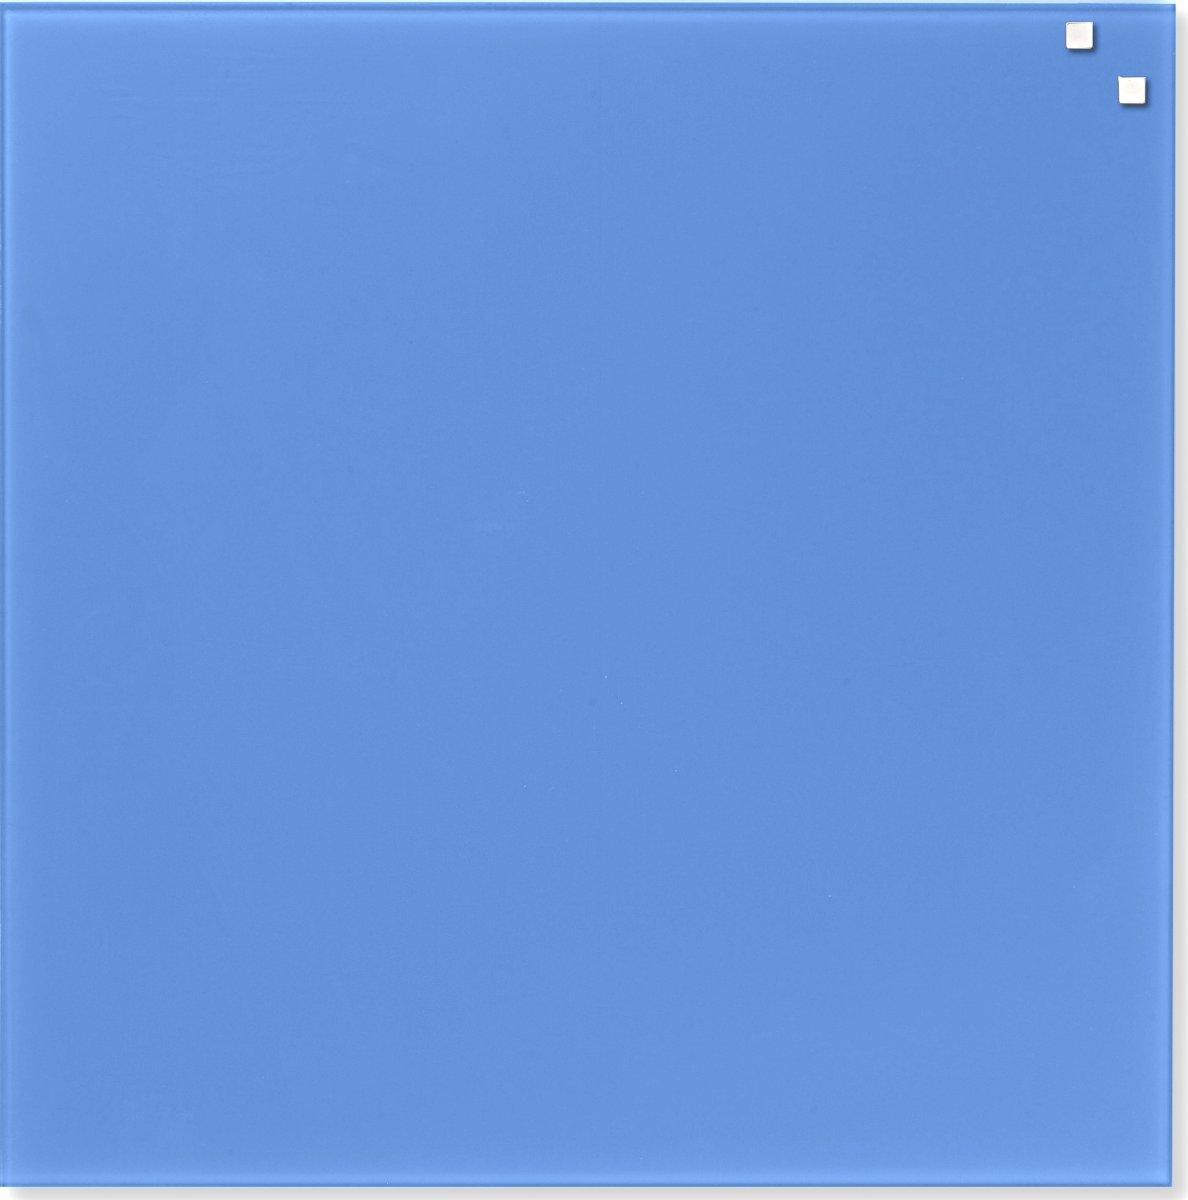 Glassboard magnetisk glastavle 45x45 cm, blå